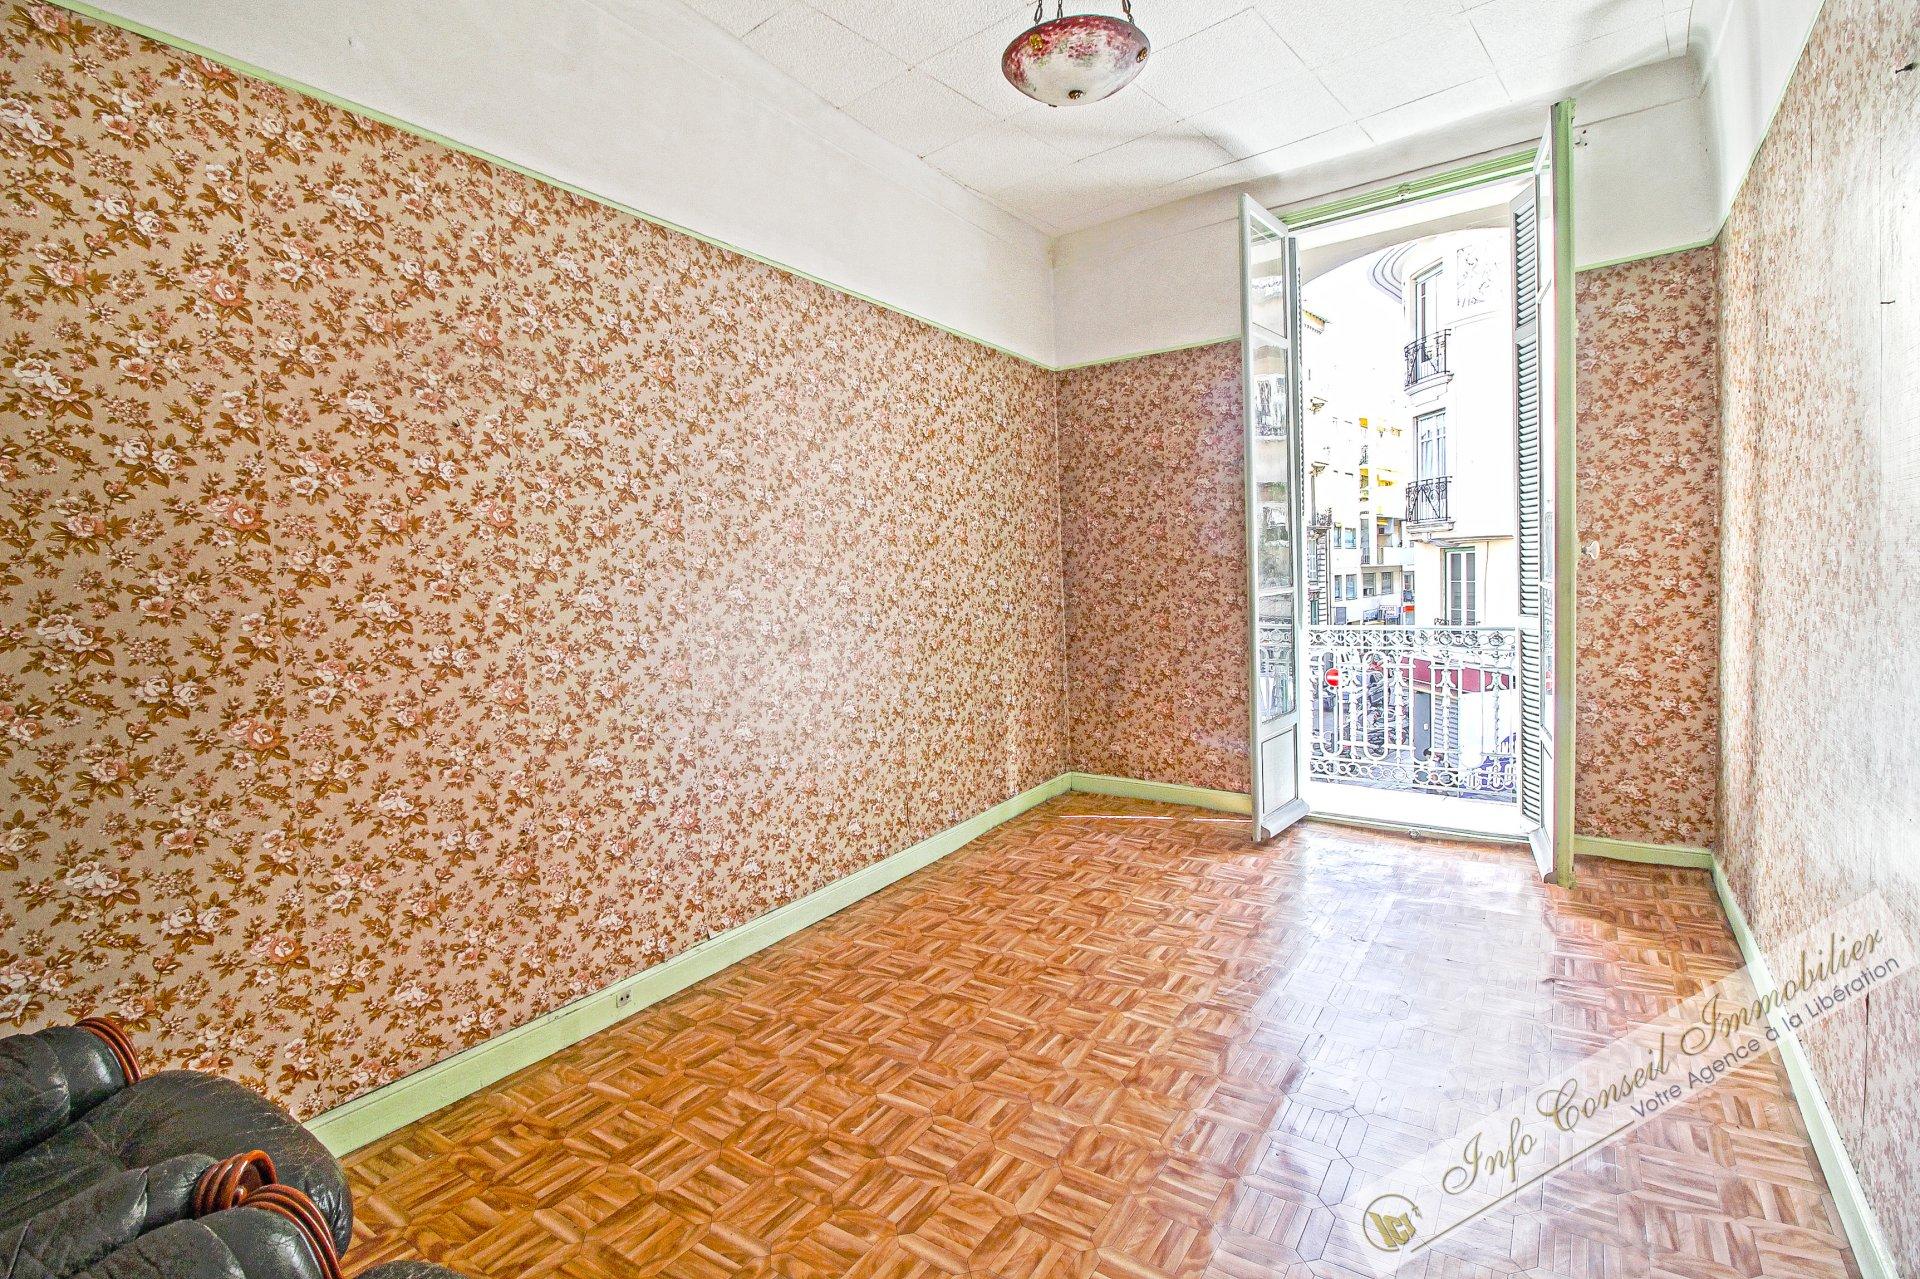 LIBERATION - Bourgeois - 3P - Balcon - A rénover - 200.000 €